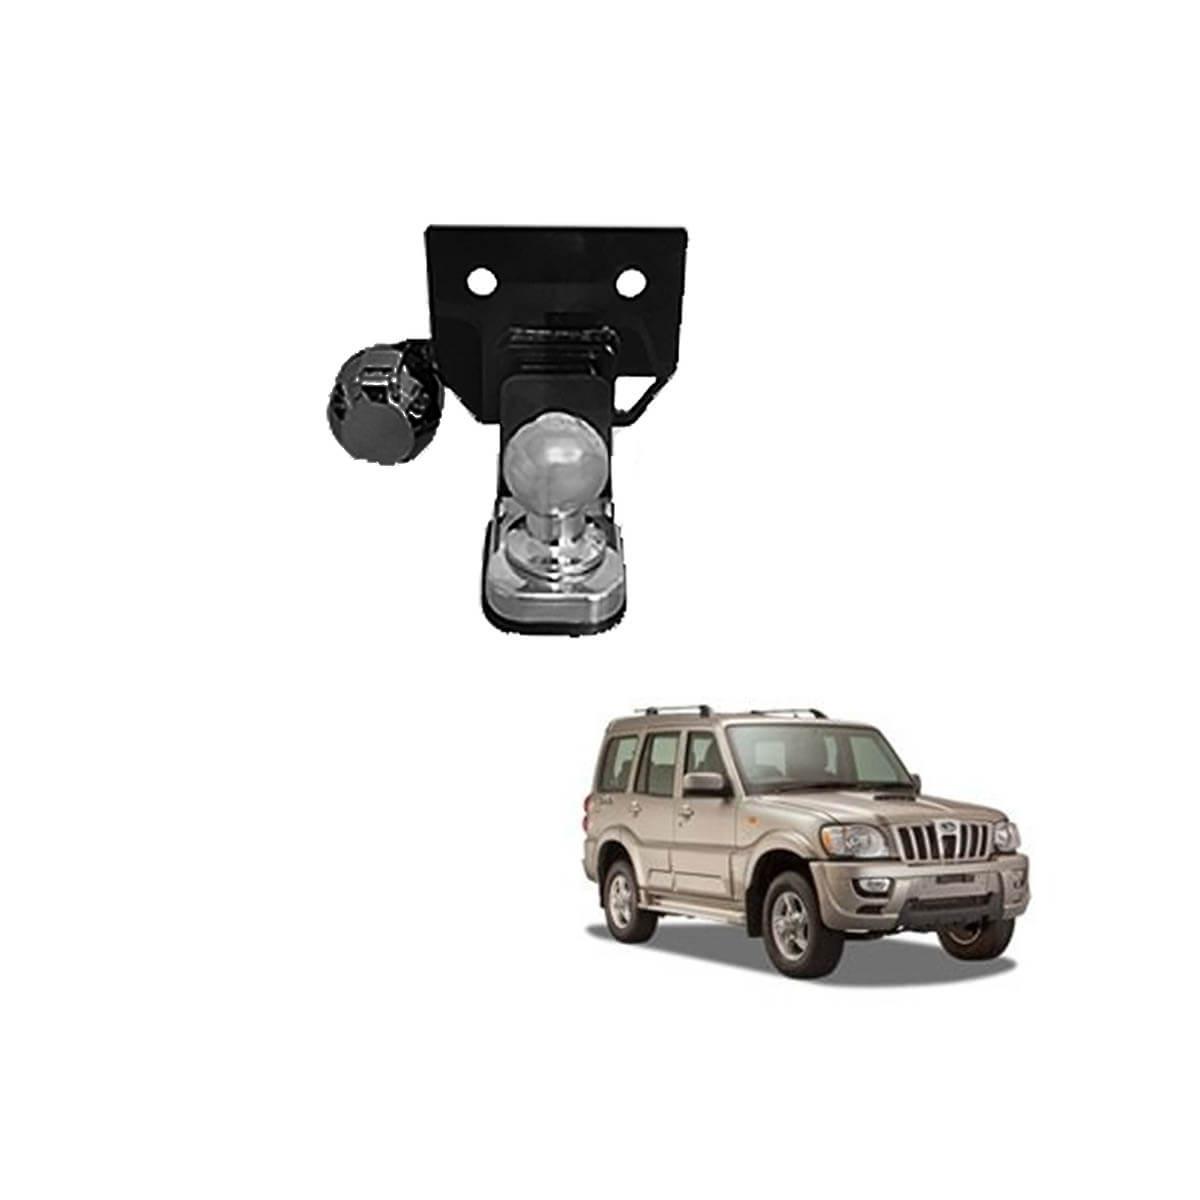 Engate de reboque Mahindra SUV 2008 a 2014 Gedeval removível 700 Kg